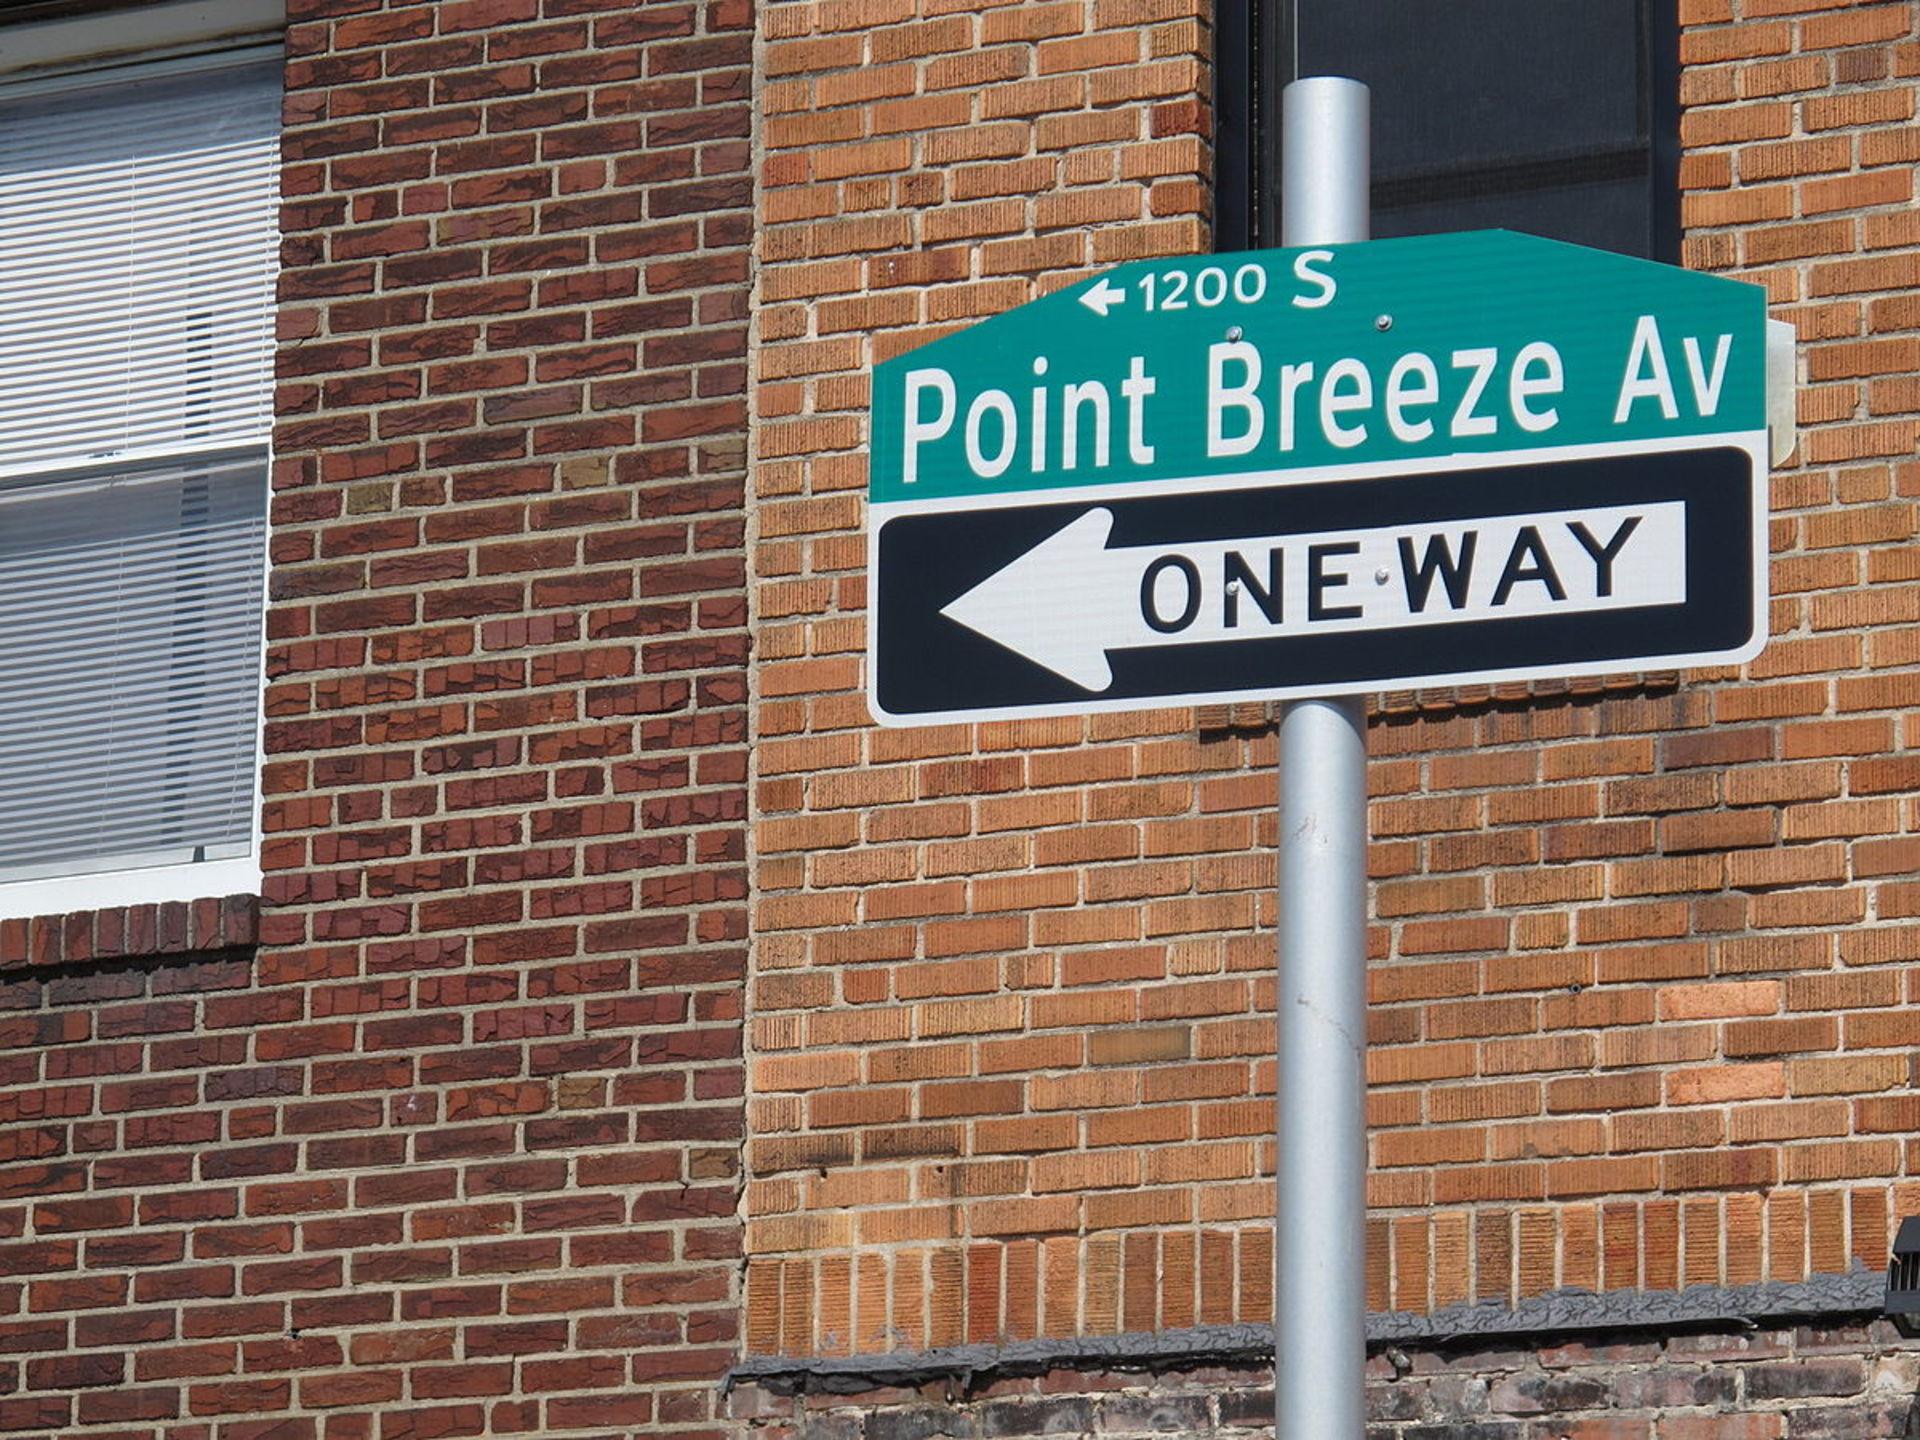 Point Breeze